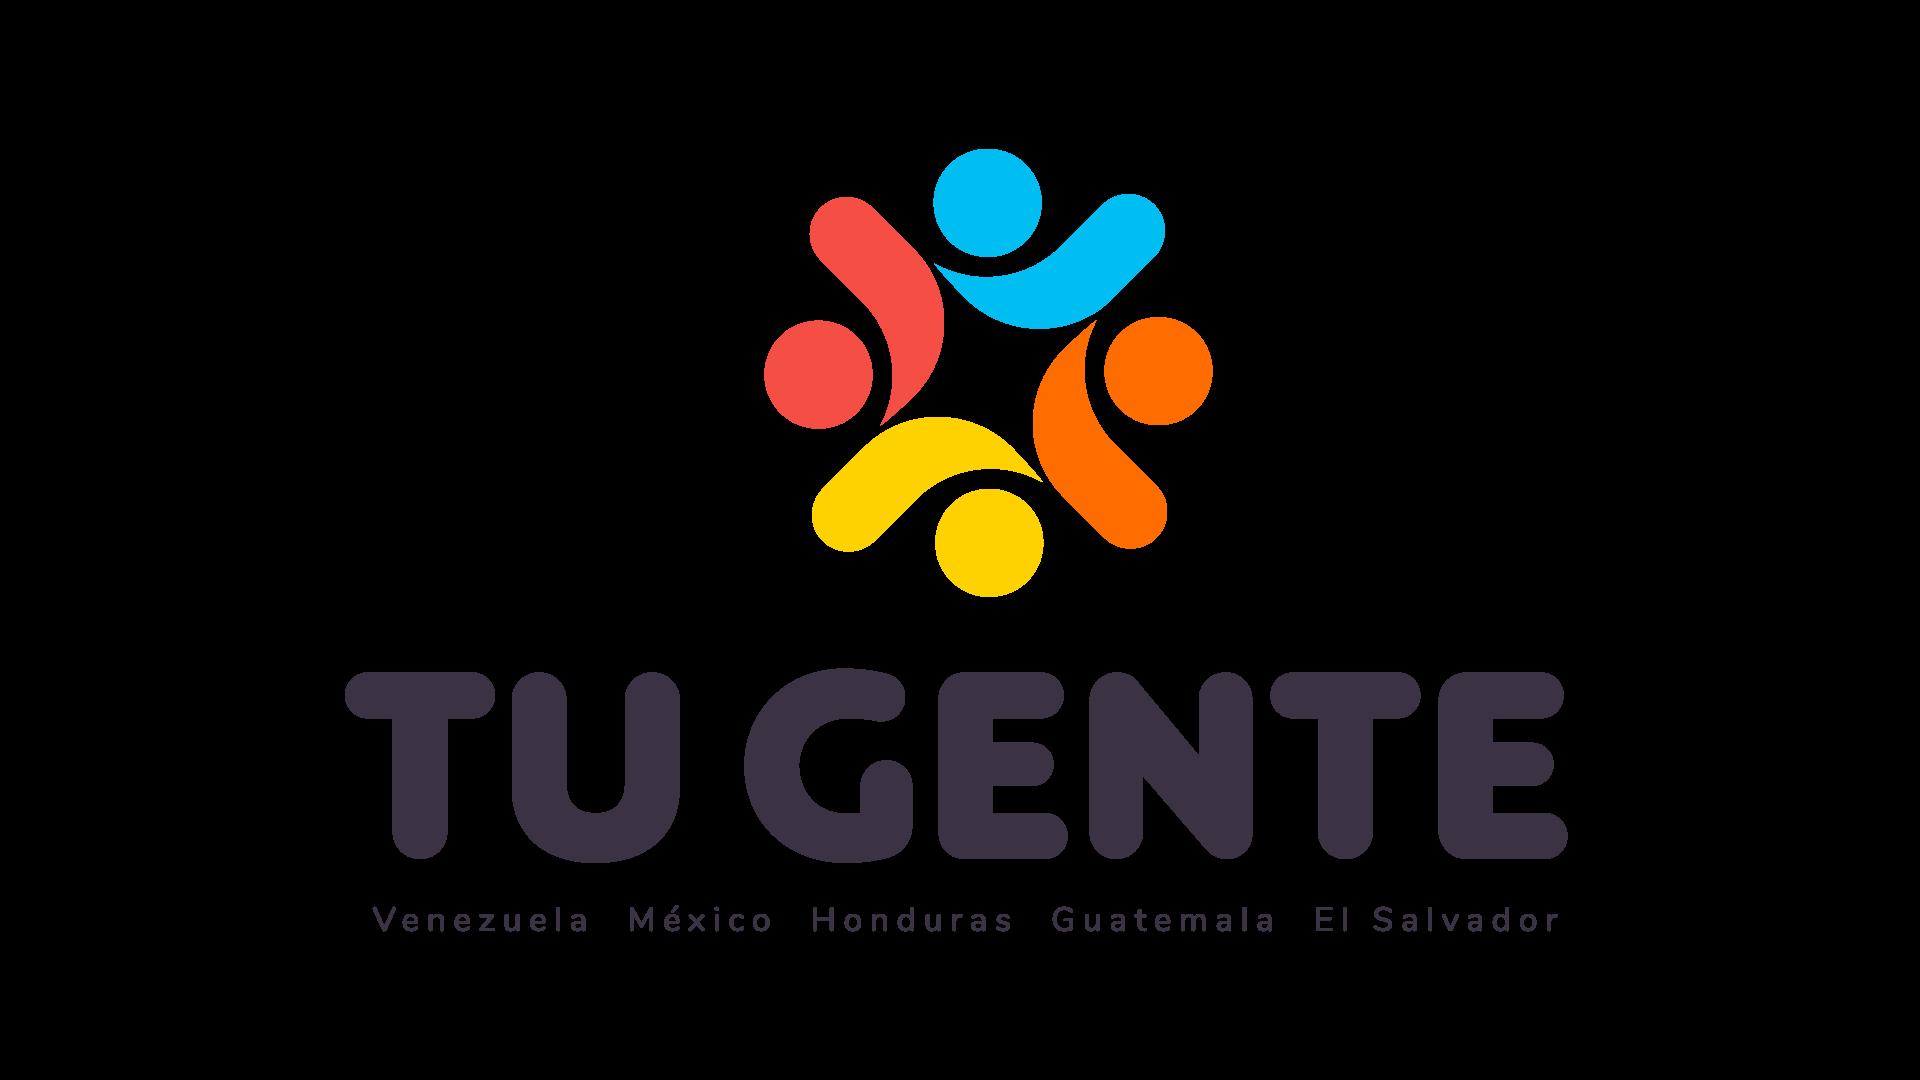 Tugente Startup logo